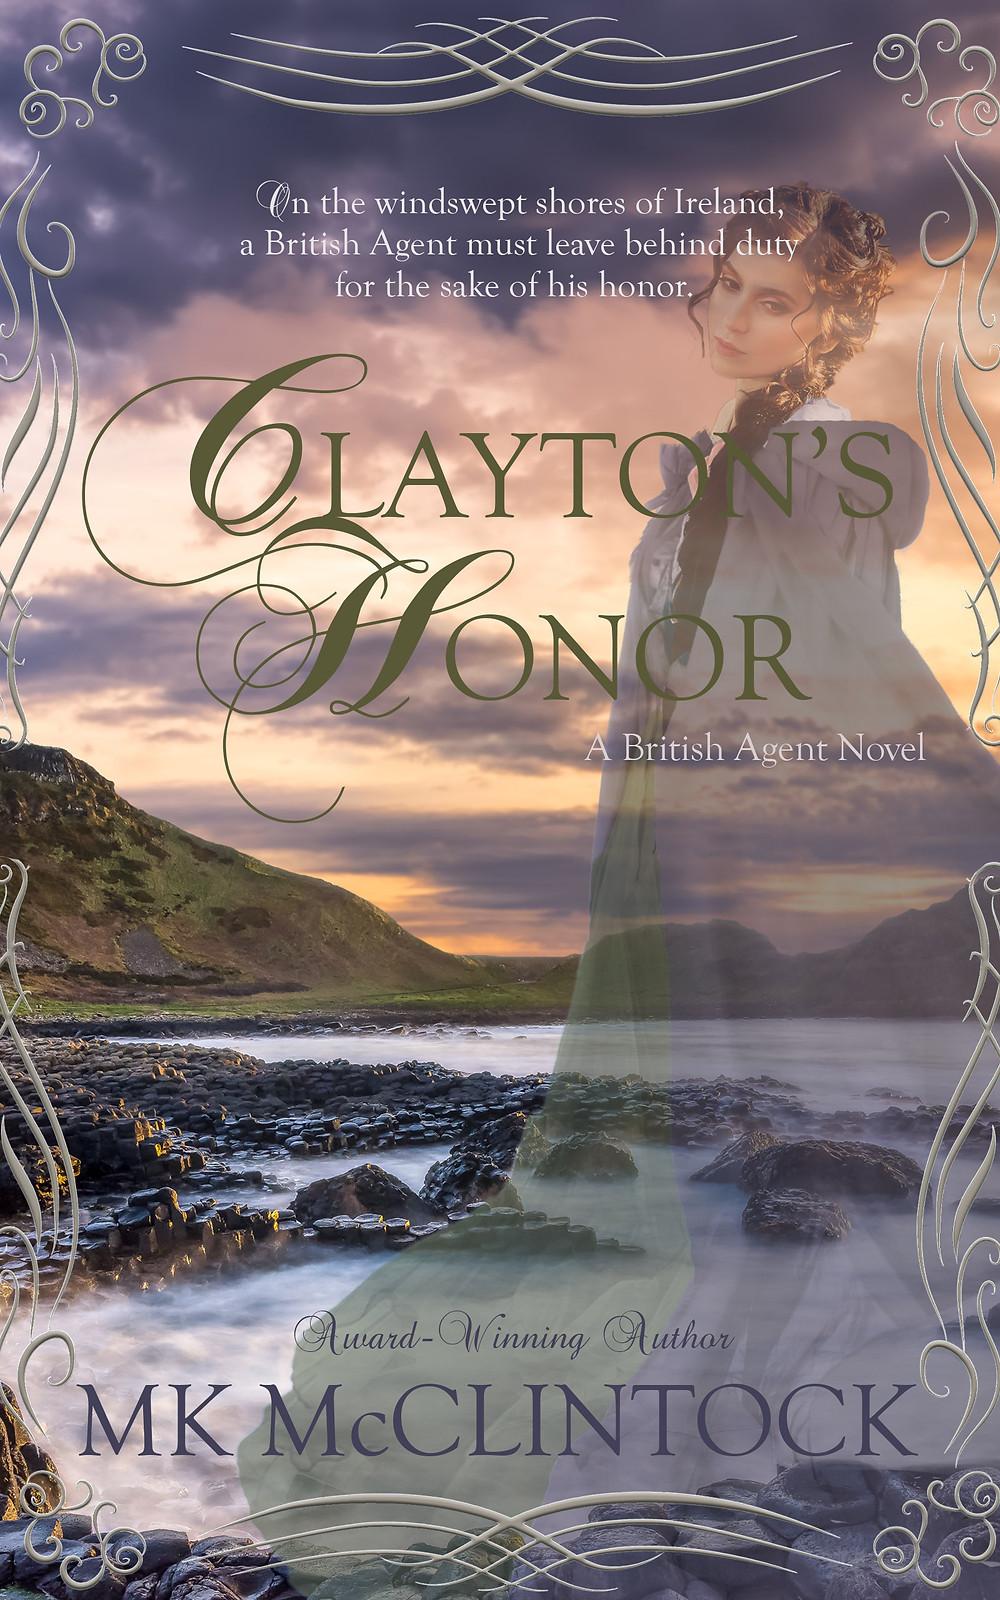 CLAYTON'S HONOR by MK McClintock - historical romance mystery